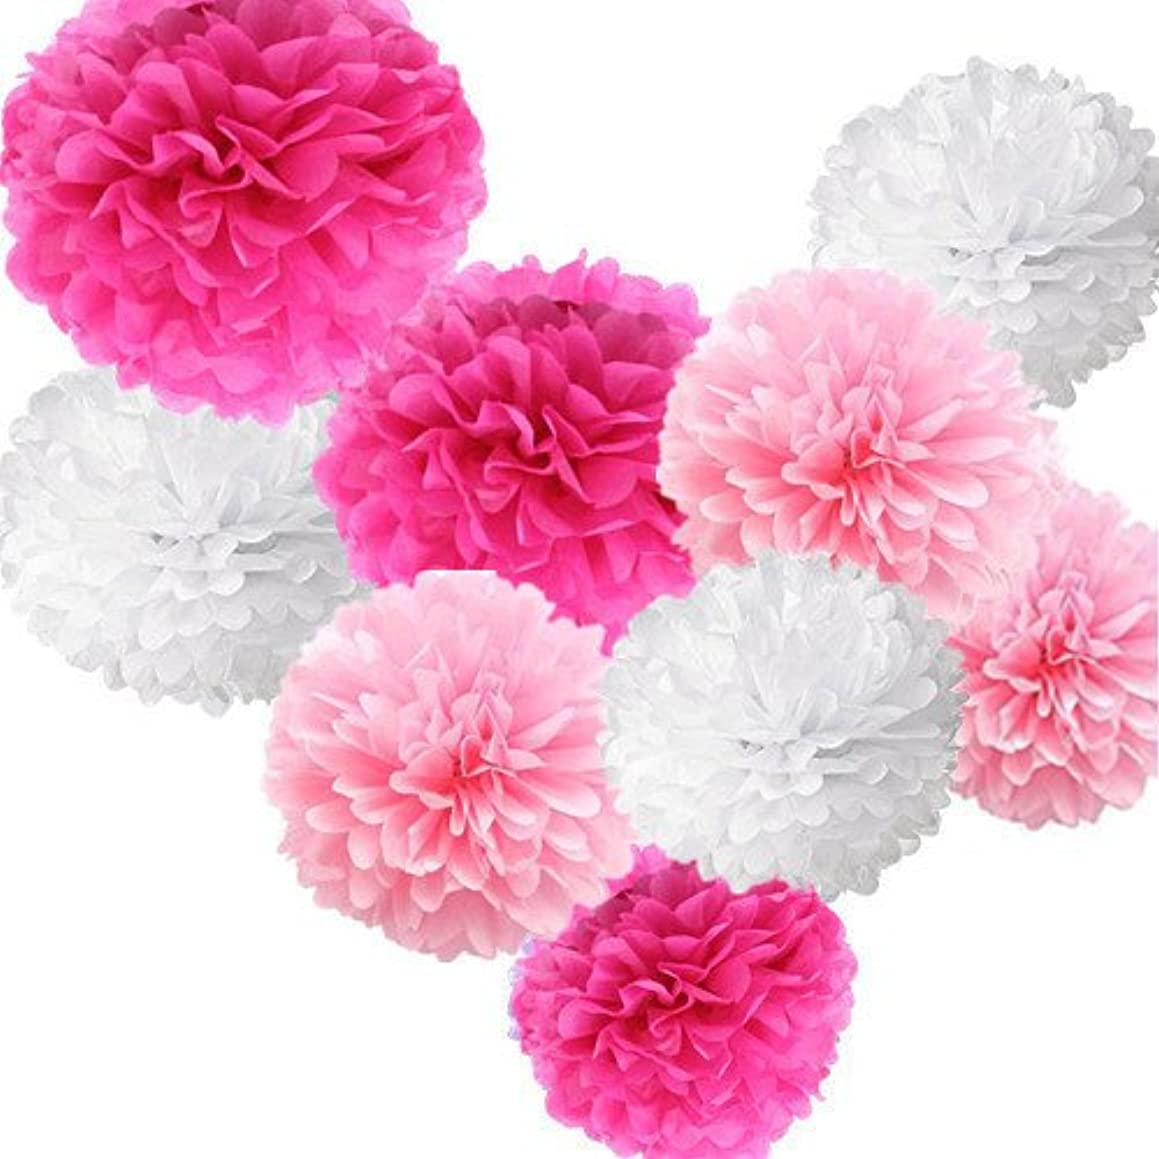 Fonder Mols Large Tissue Paper Flowers Tissue Pom Poms Set Diy Crafting for Wedding, Birthday, Baby Shower, Bachelorette, Nursery Decor (9pcs, White Pink Fushia)